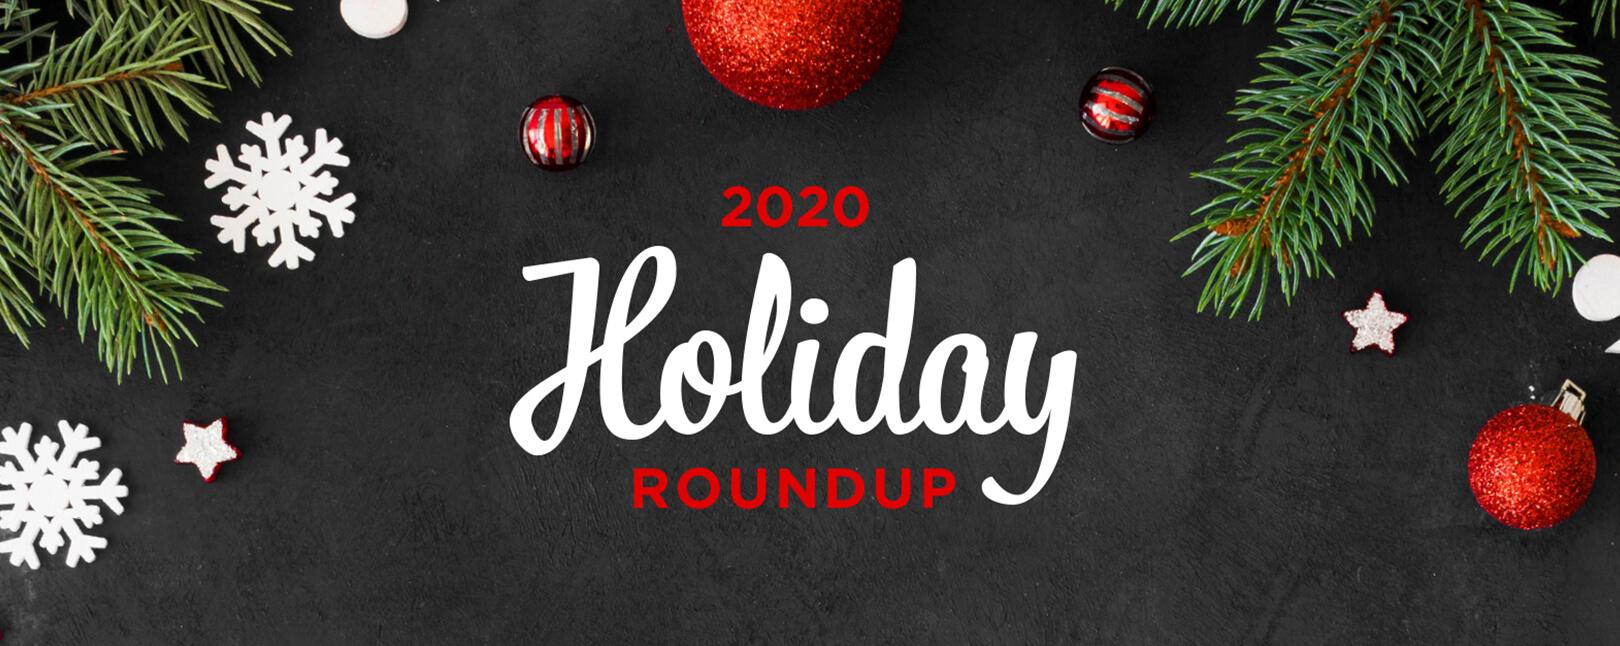 2020 Holiday Roundup